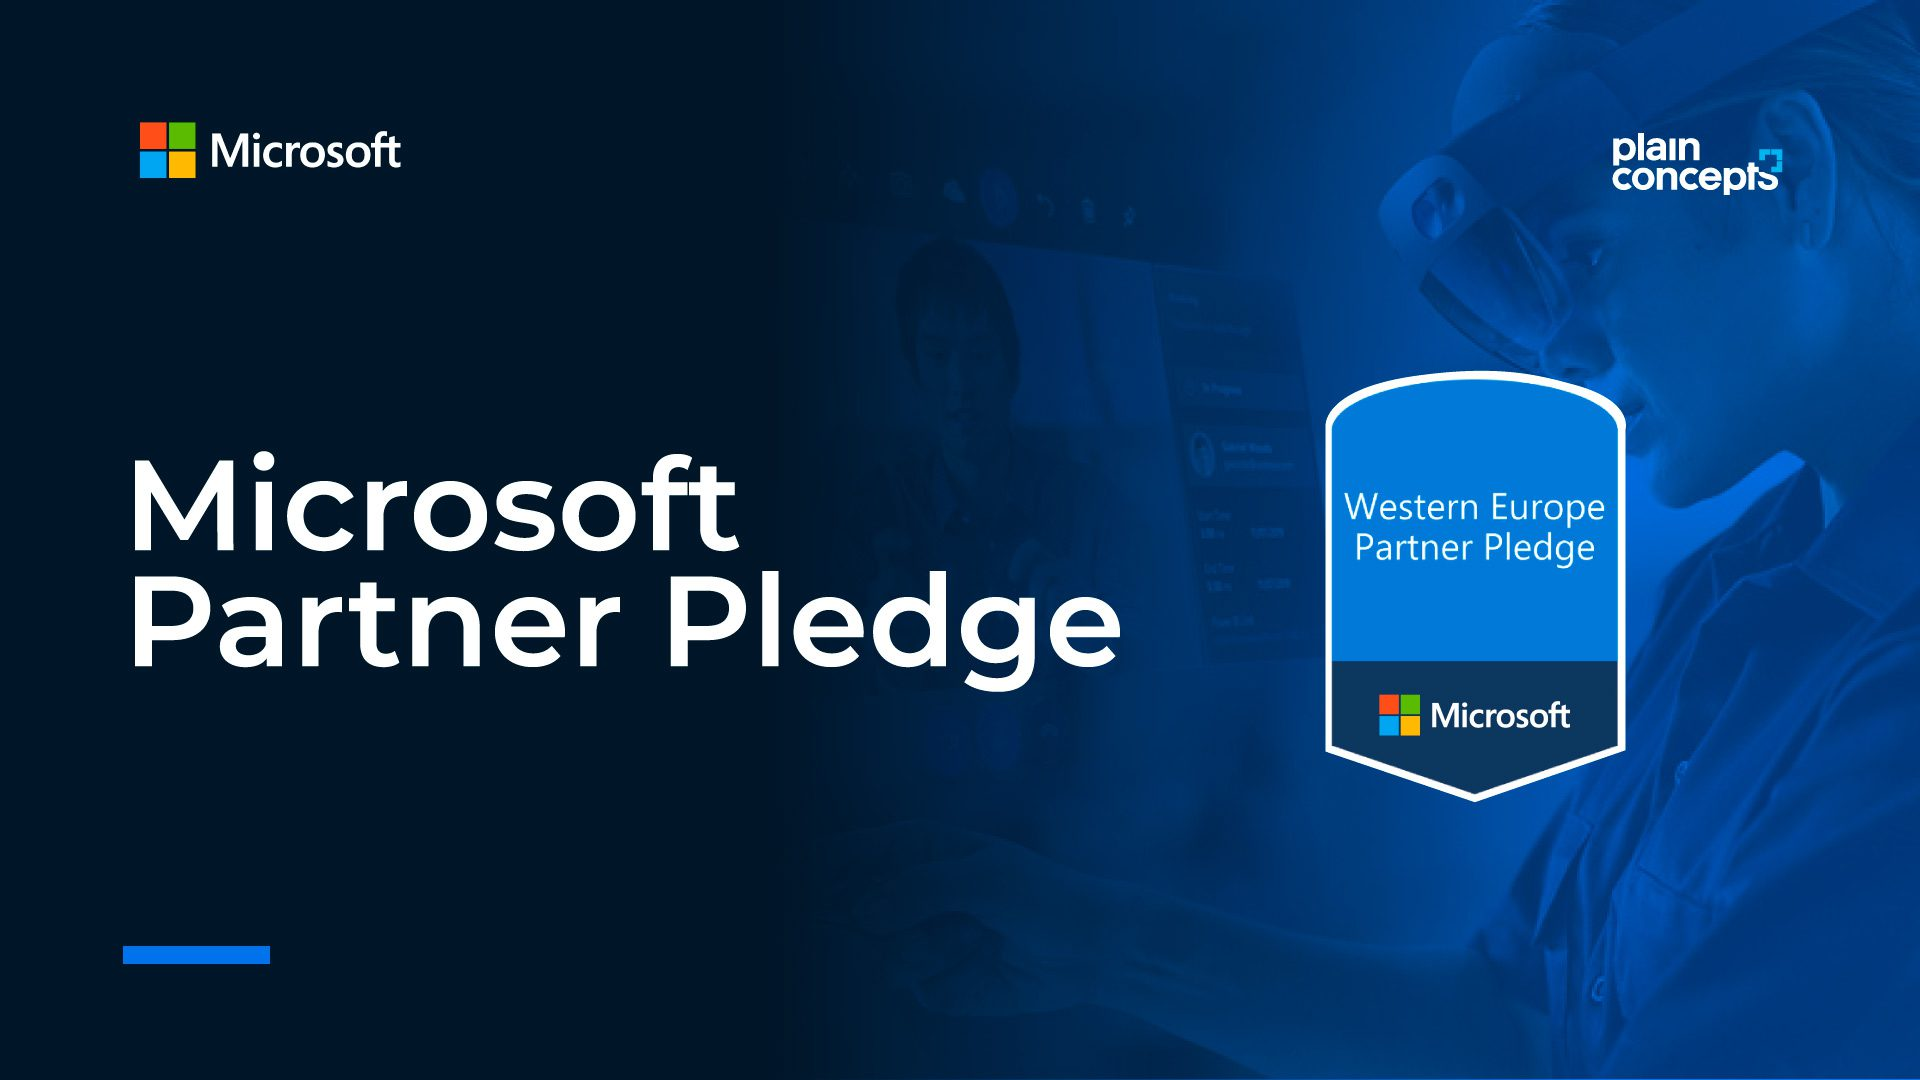 Microsoft Partner Pledge